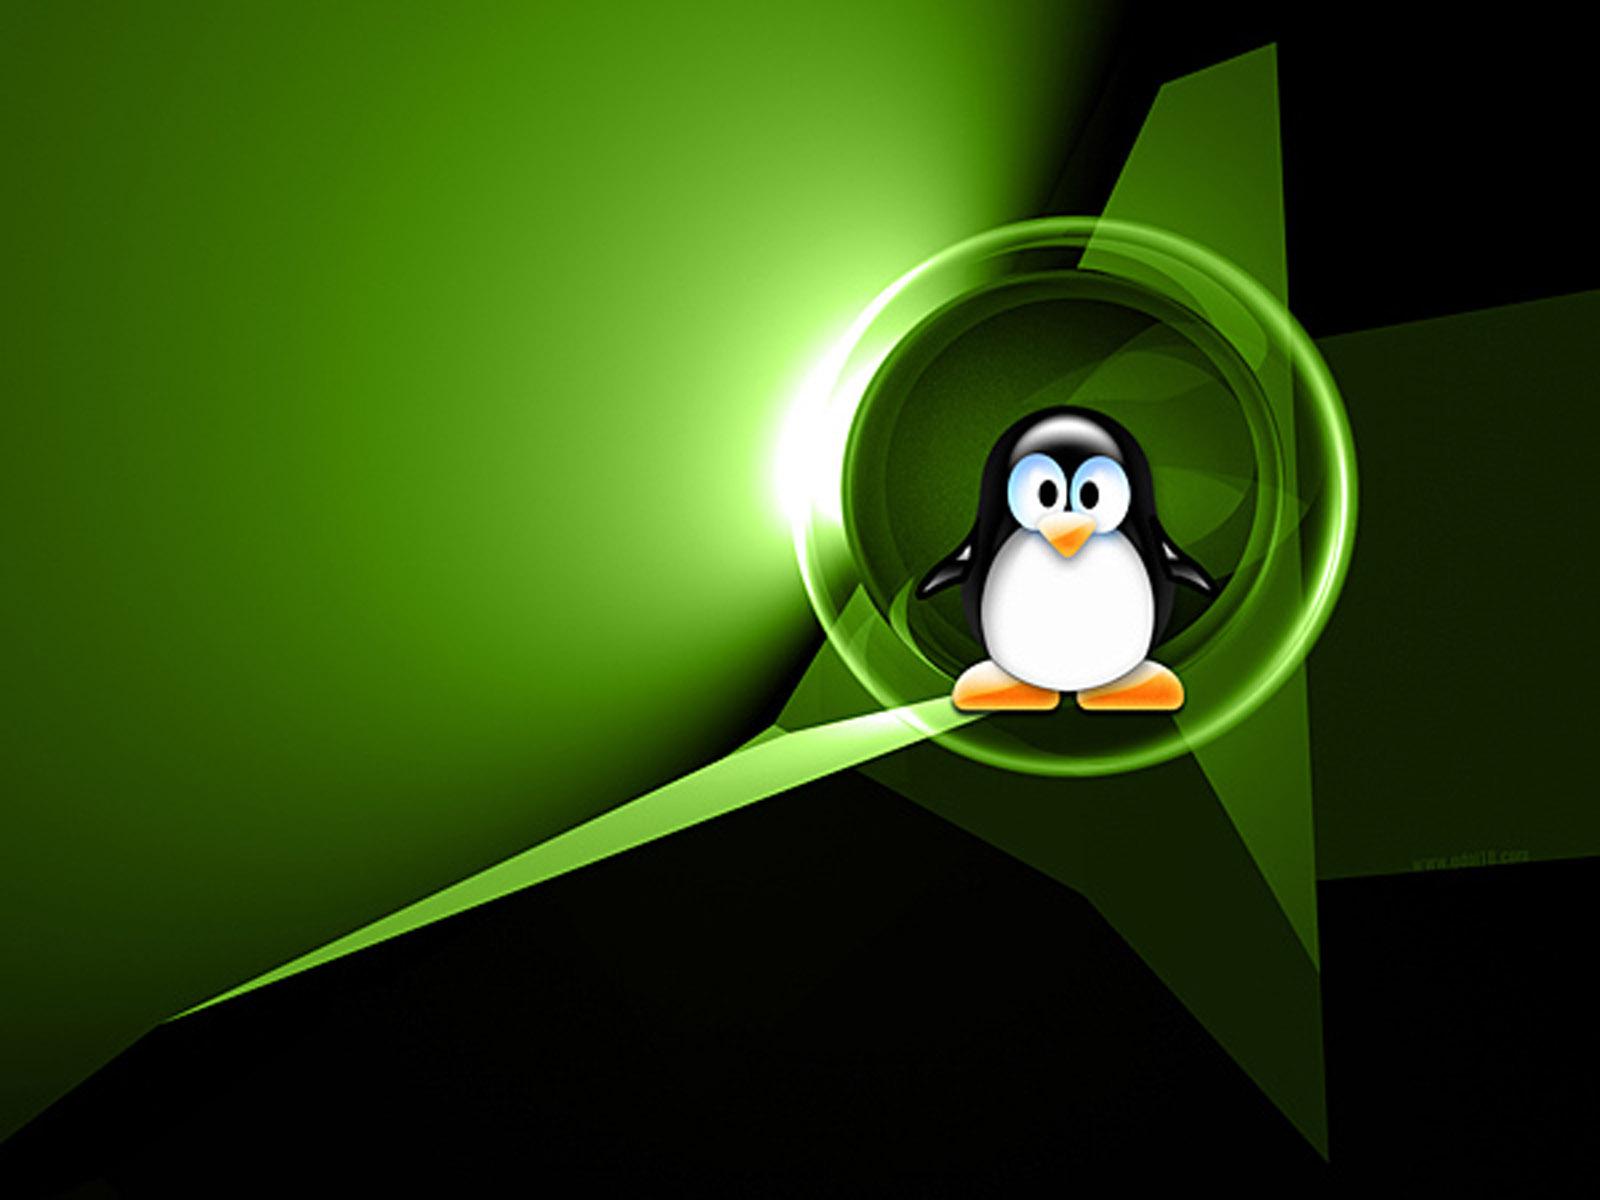 the linux desktop wallpapers linux operating system desktop background 1600x1200